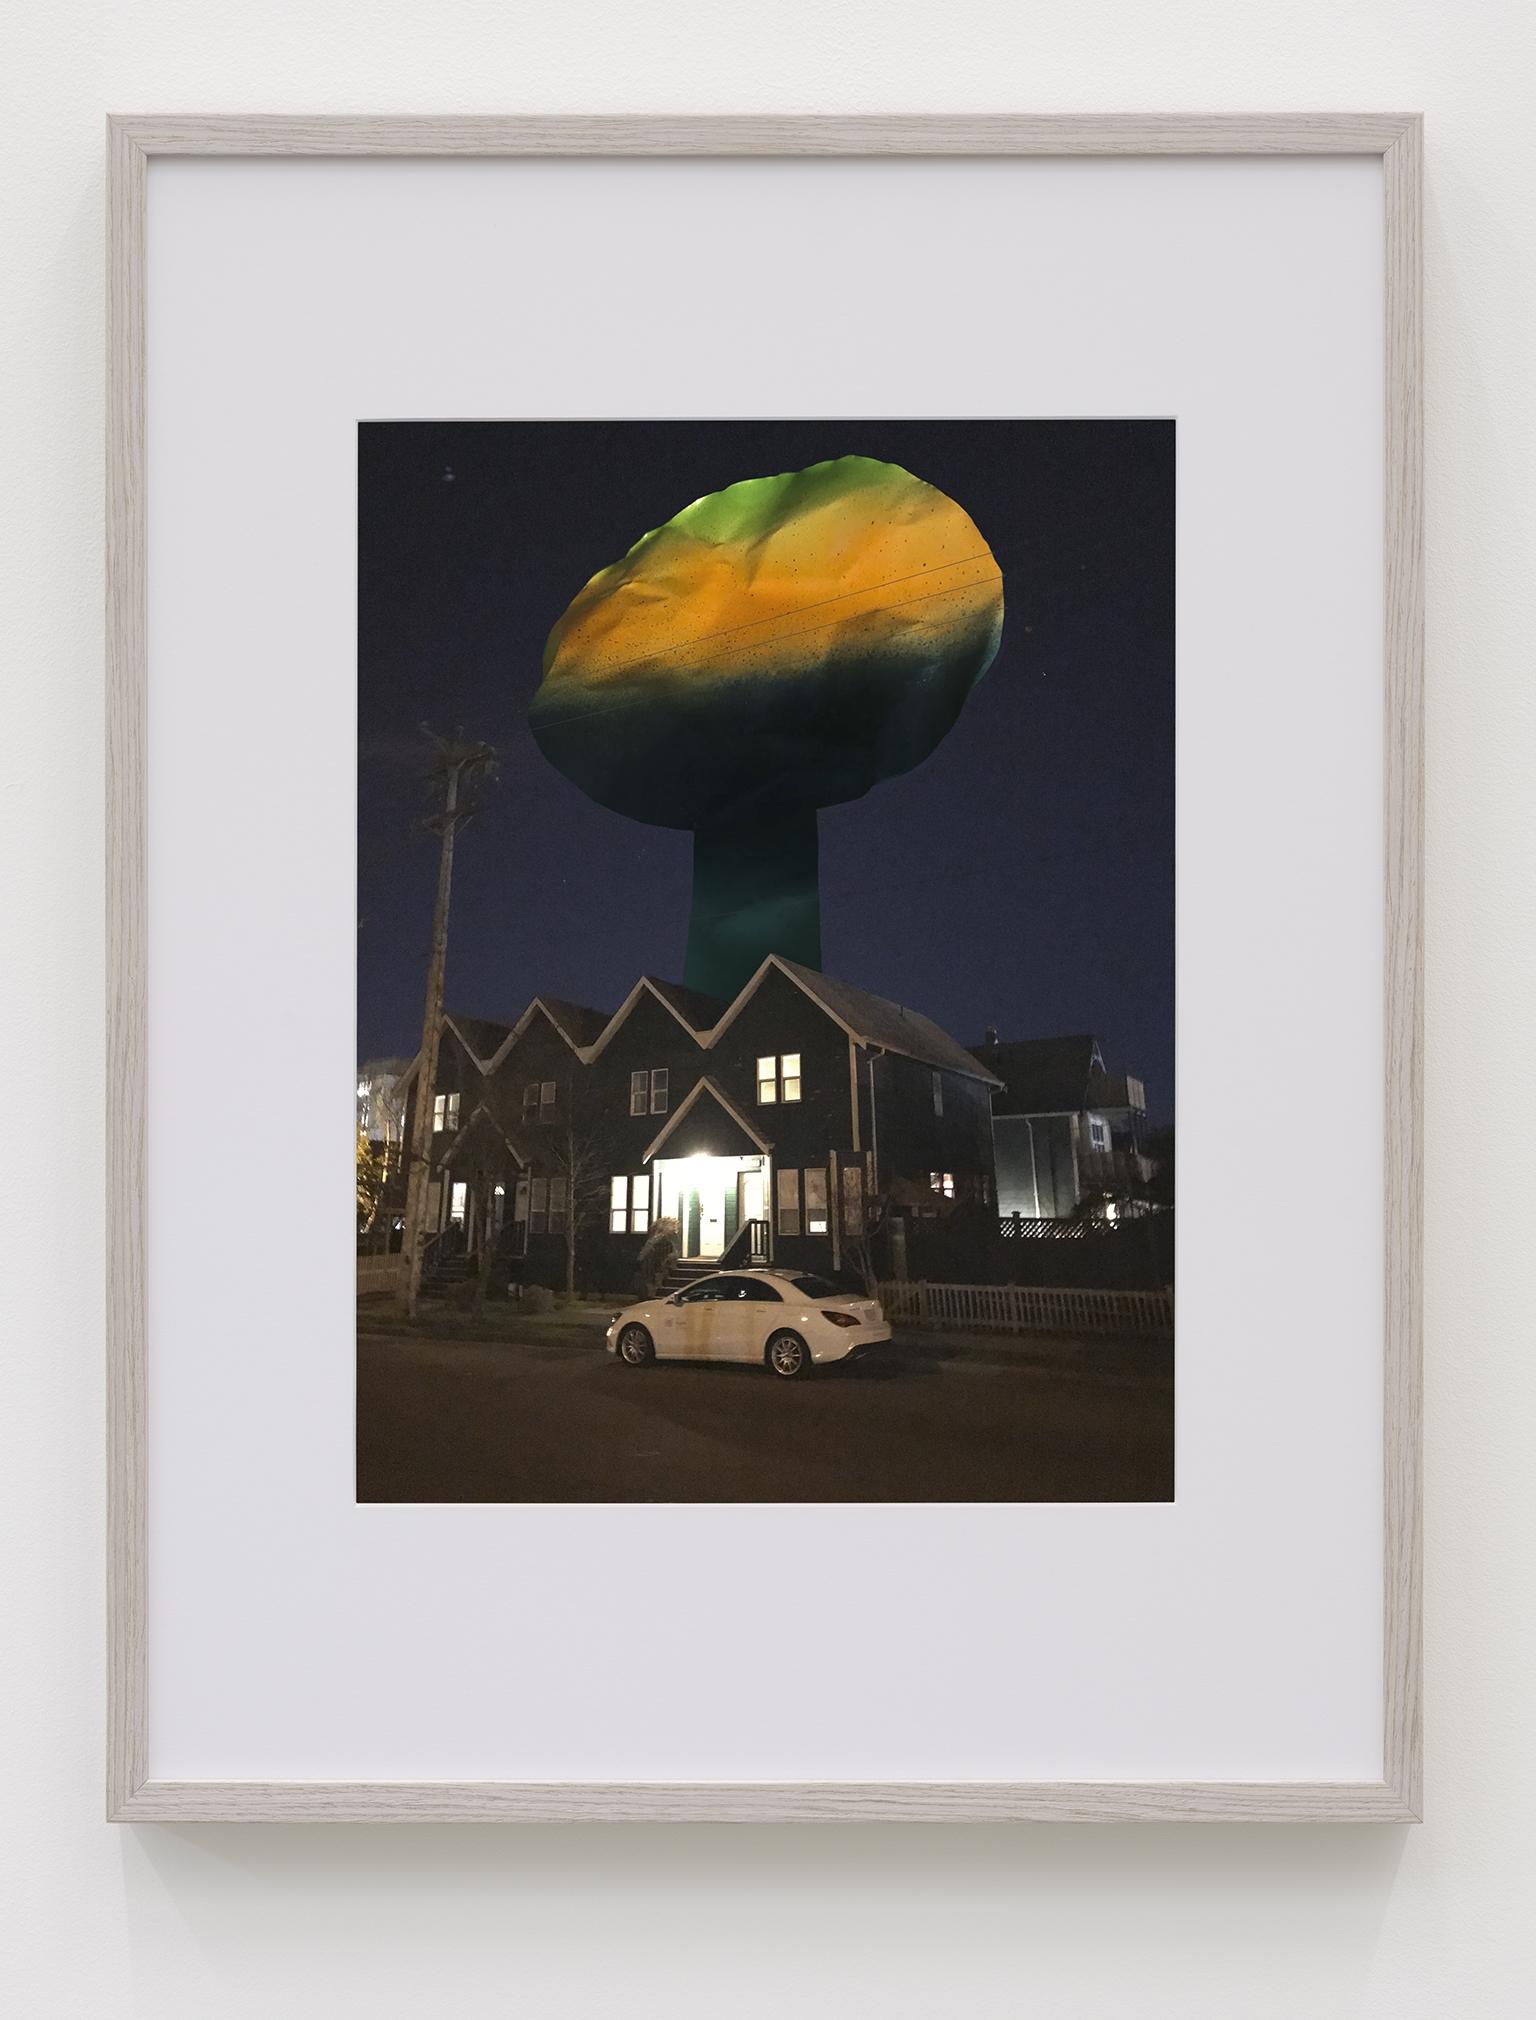 Damian Moppett, Night Monument B, 2019, inkjet print, 41 x 33 in. (104 x 84 cm) by